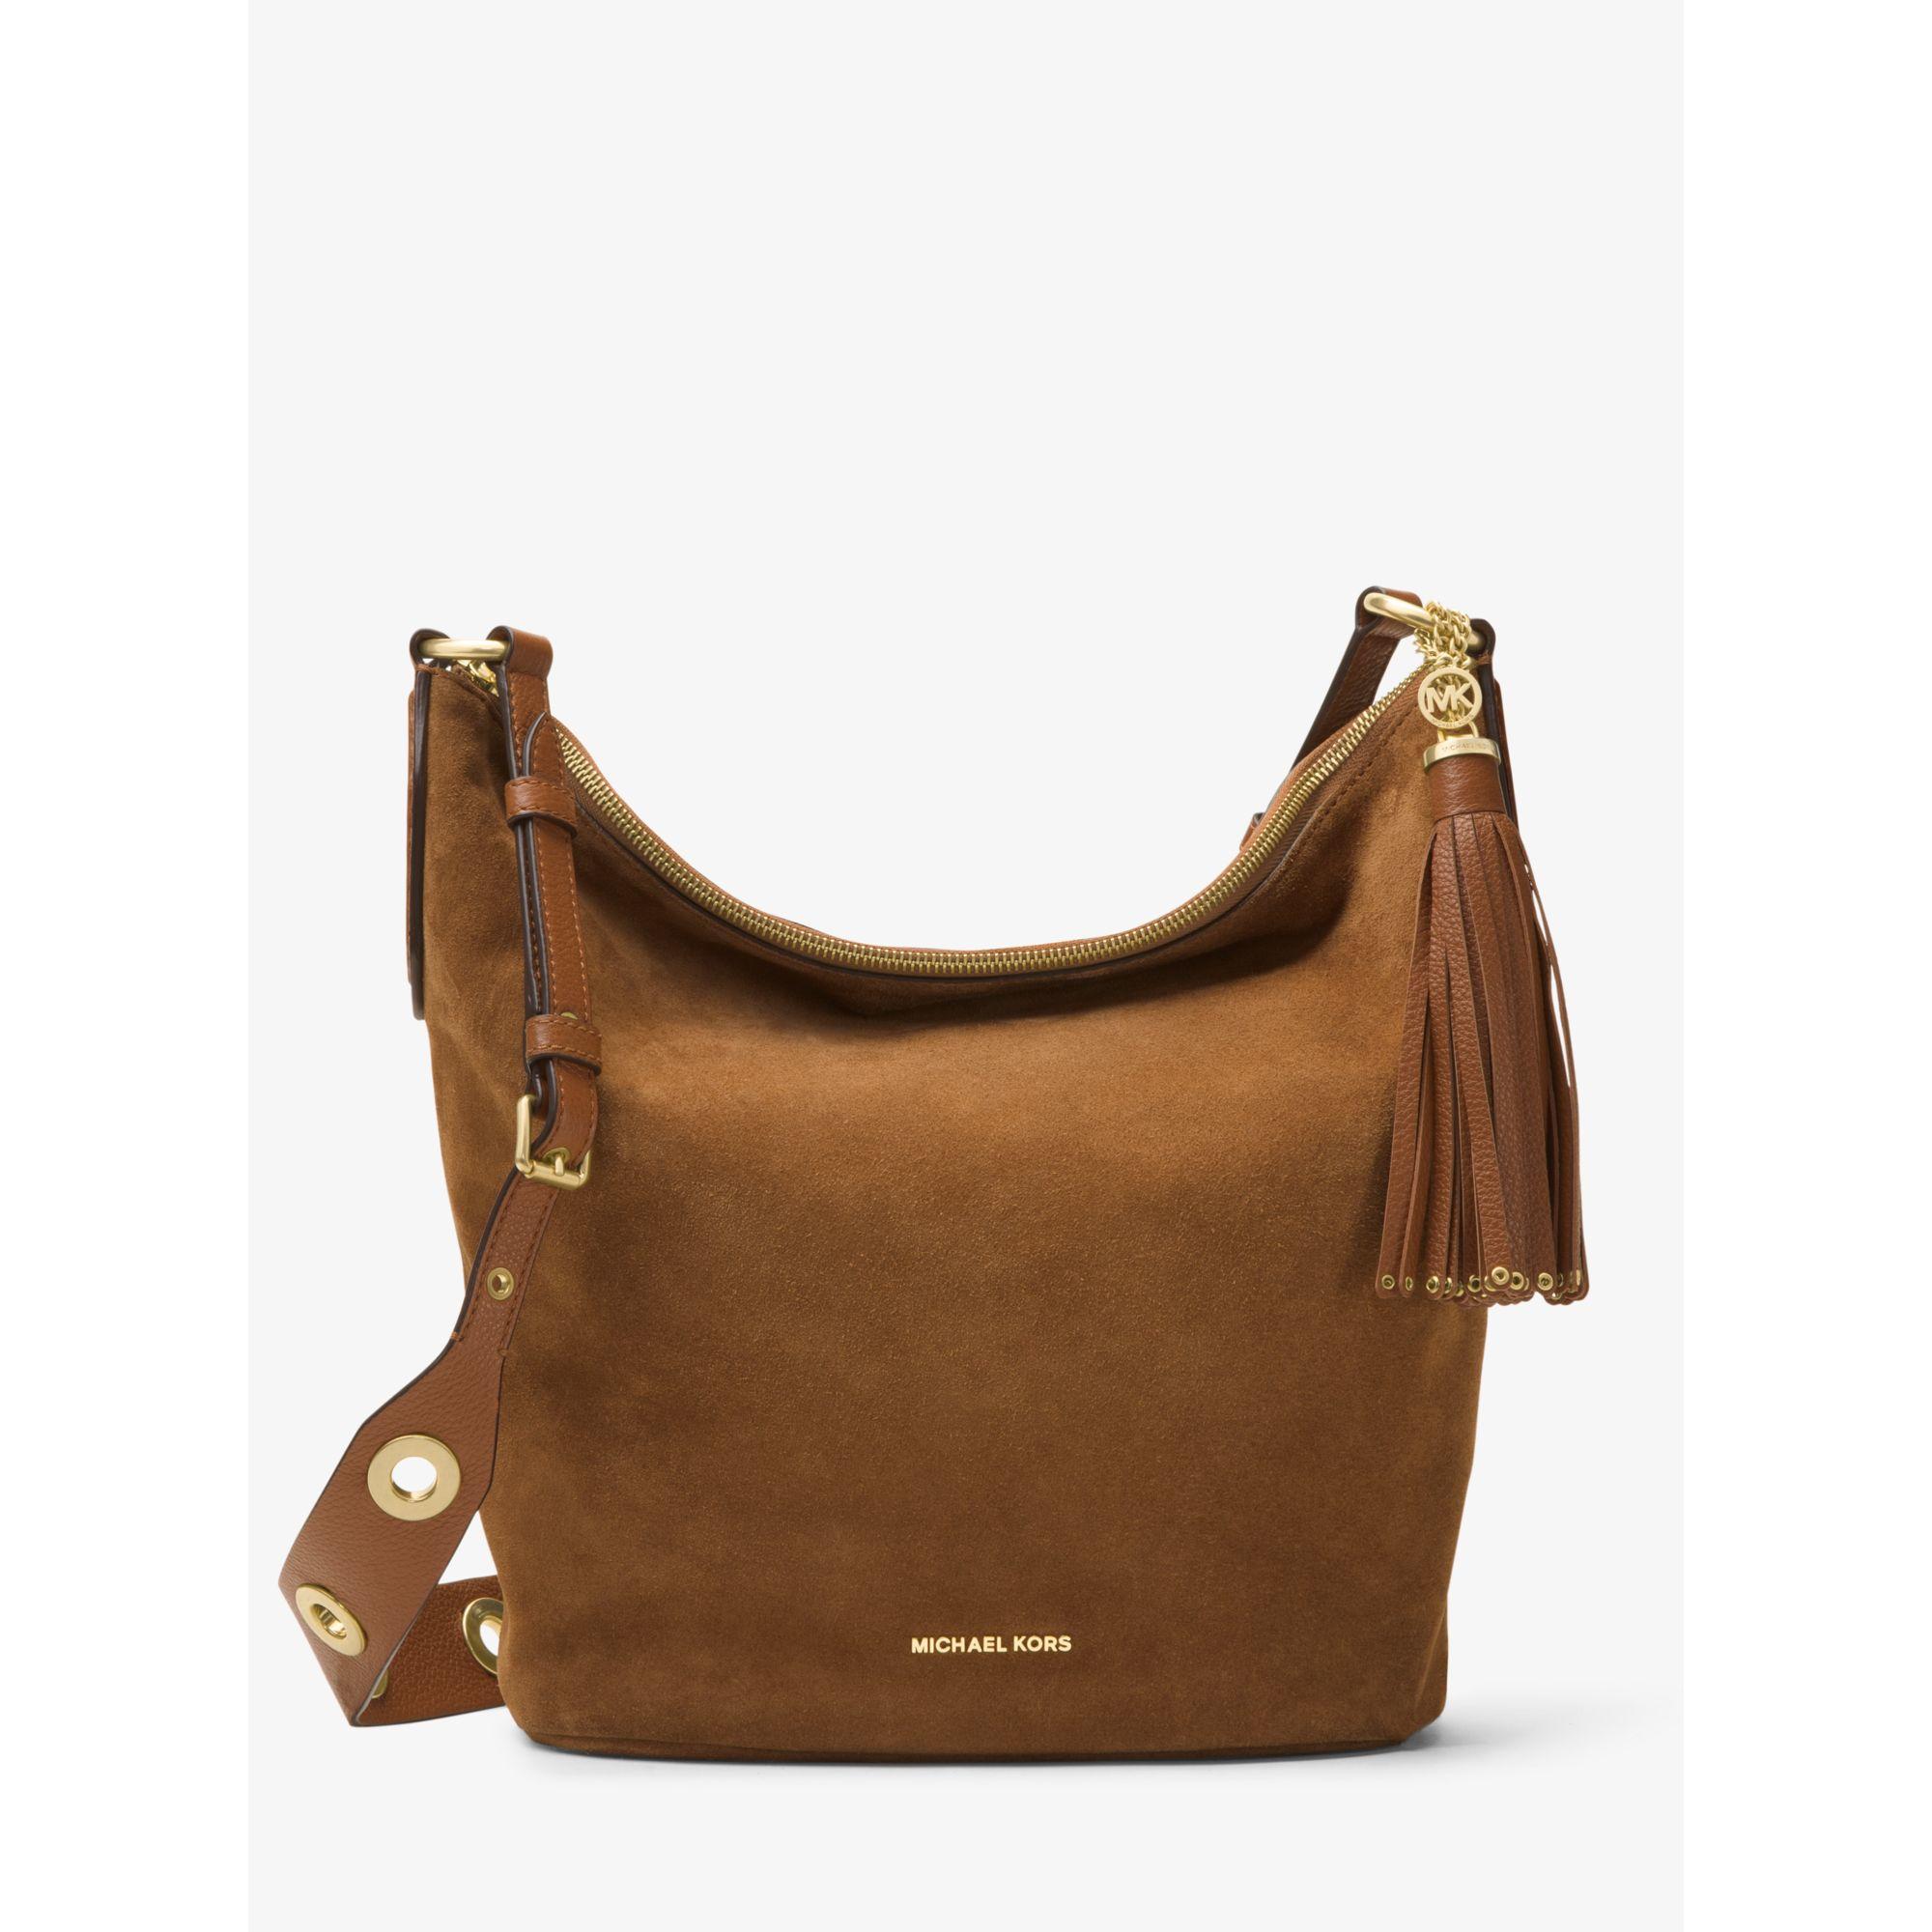 38be387bedf5 shopping michael kors handbag suede large brooklyn dc48e 383f8